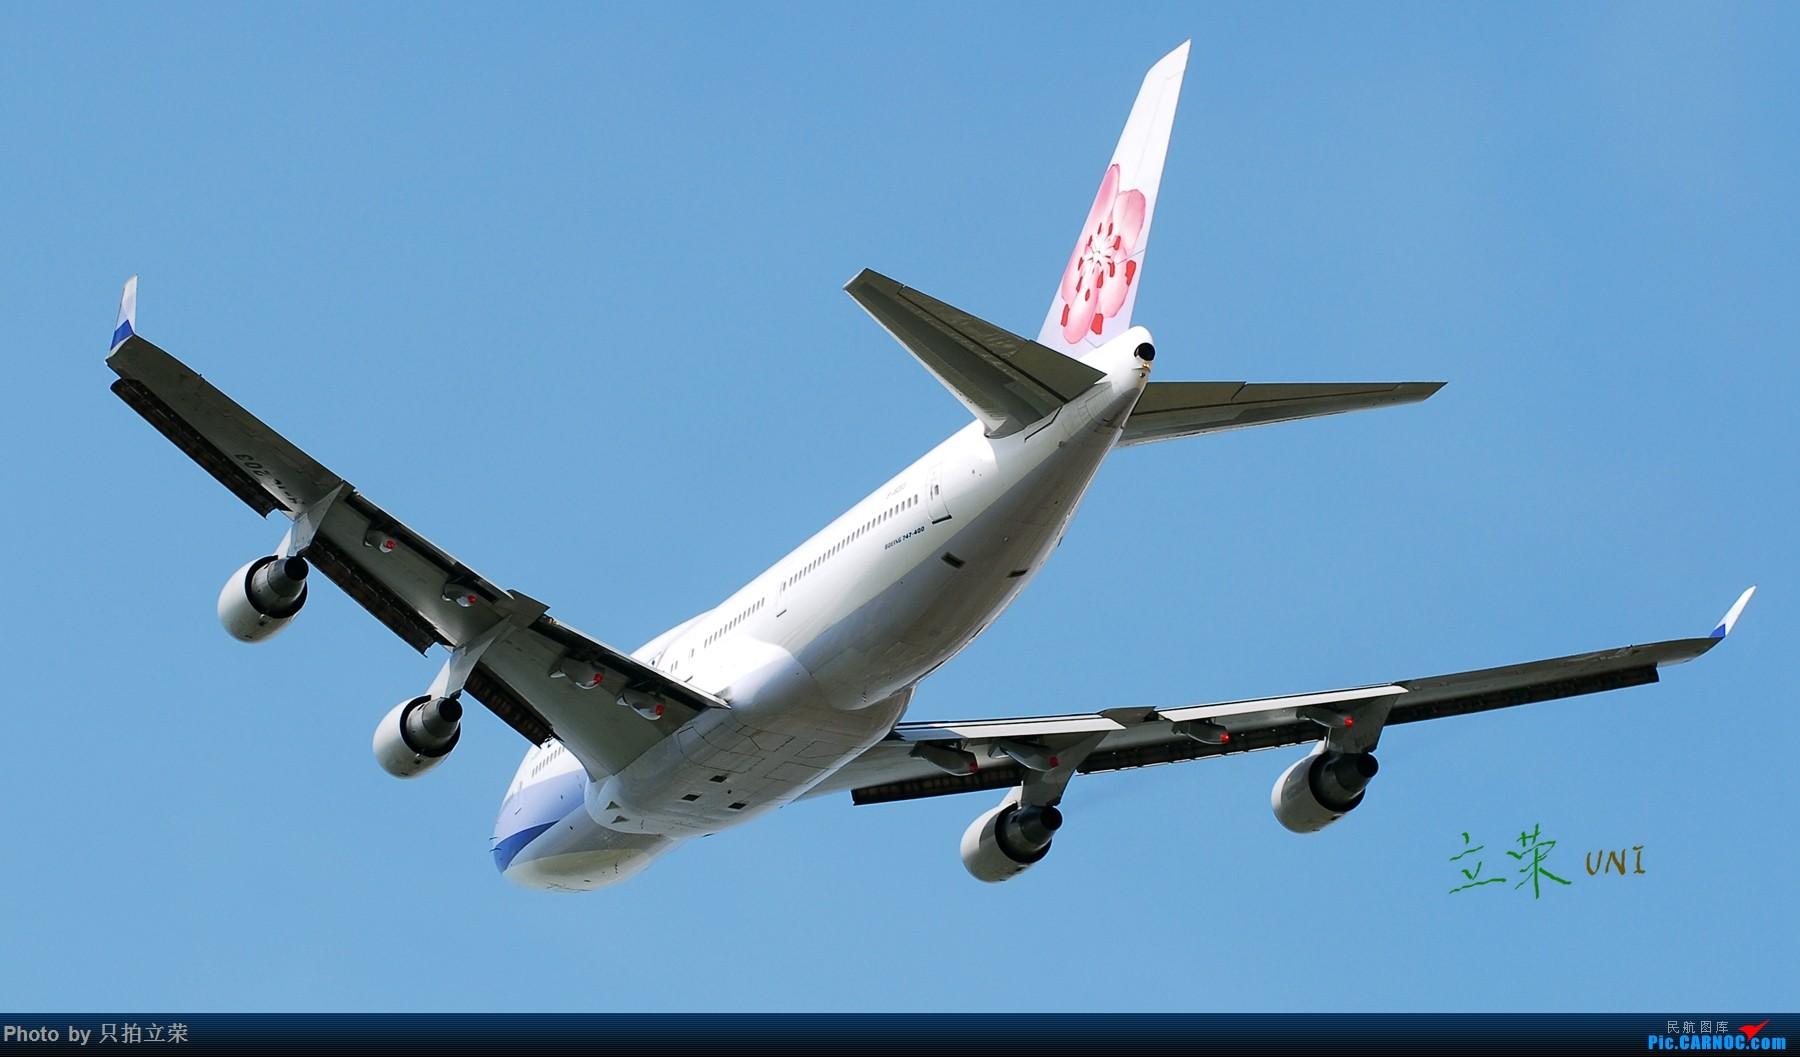 Re:[原创]第一次发图,长沙的大梅花们 BOEING 747-400 B-18203 中国长沙黄花国际机场